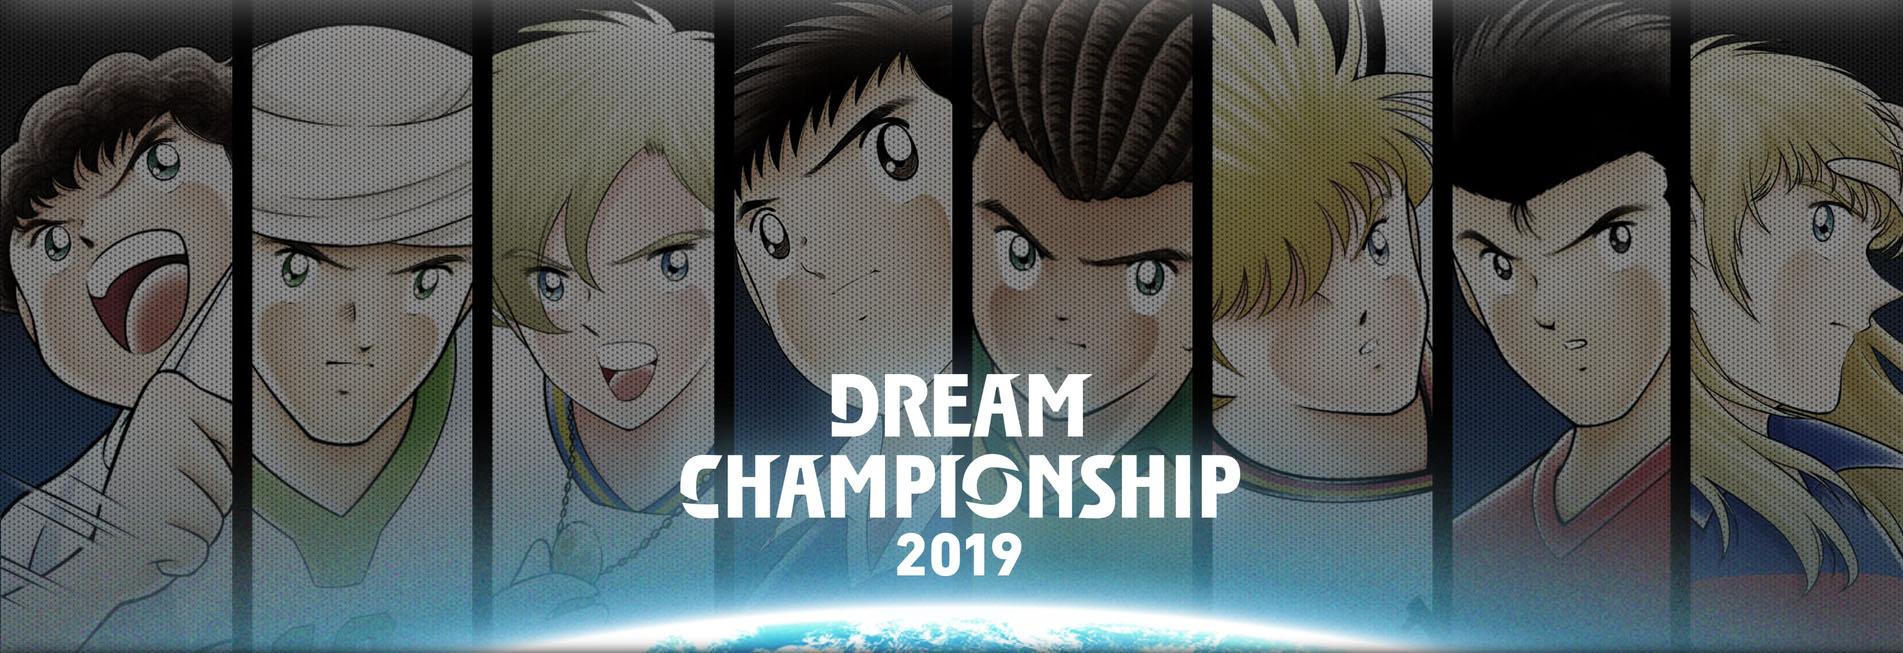 Dream Championship 2019